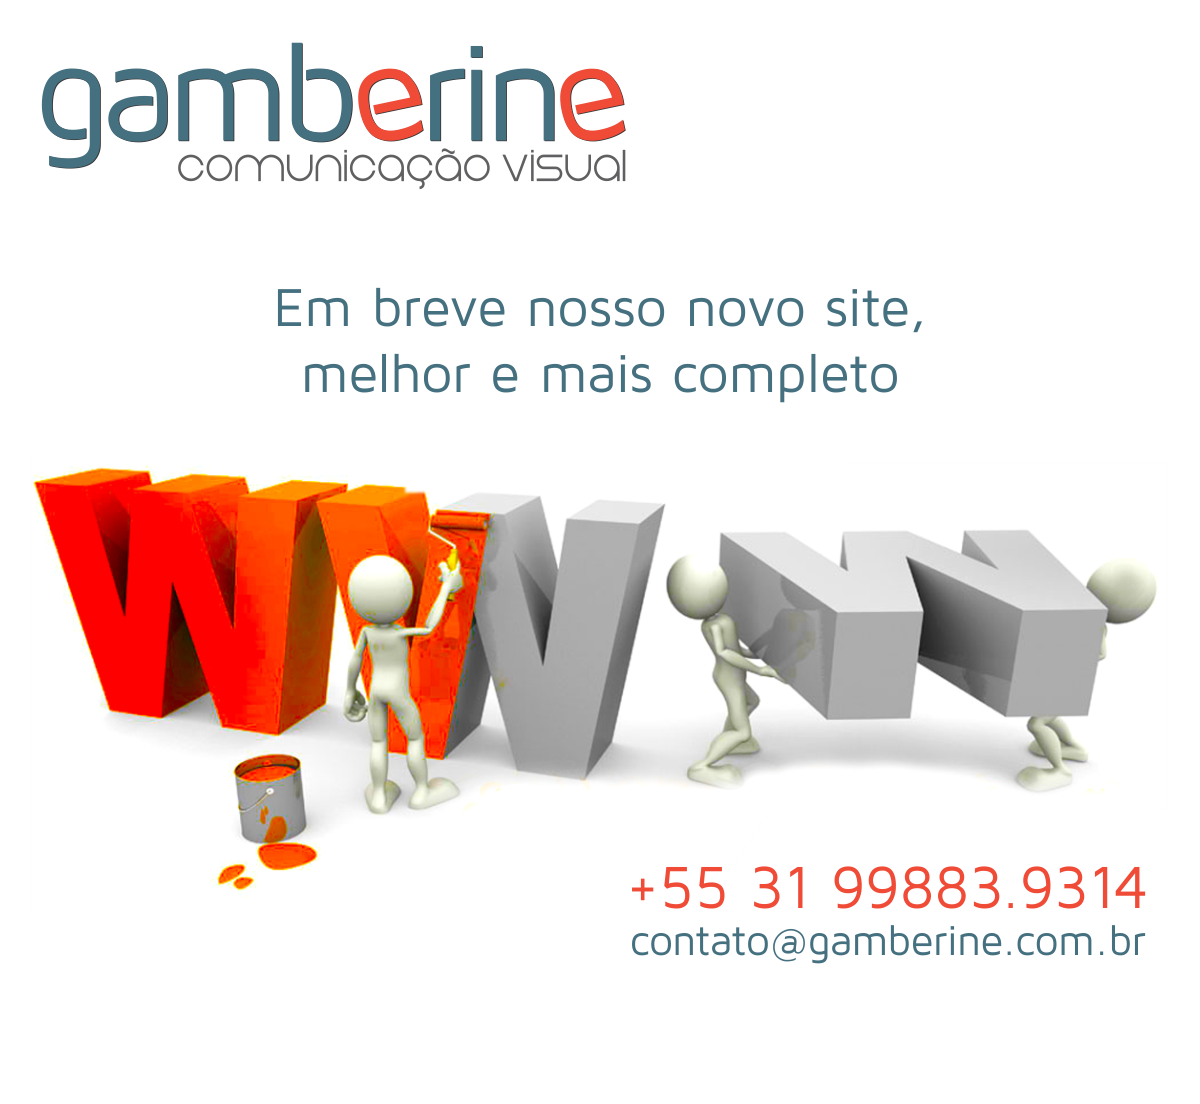 www.gamberine.com.br